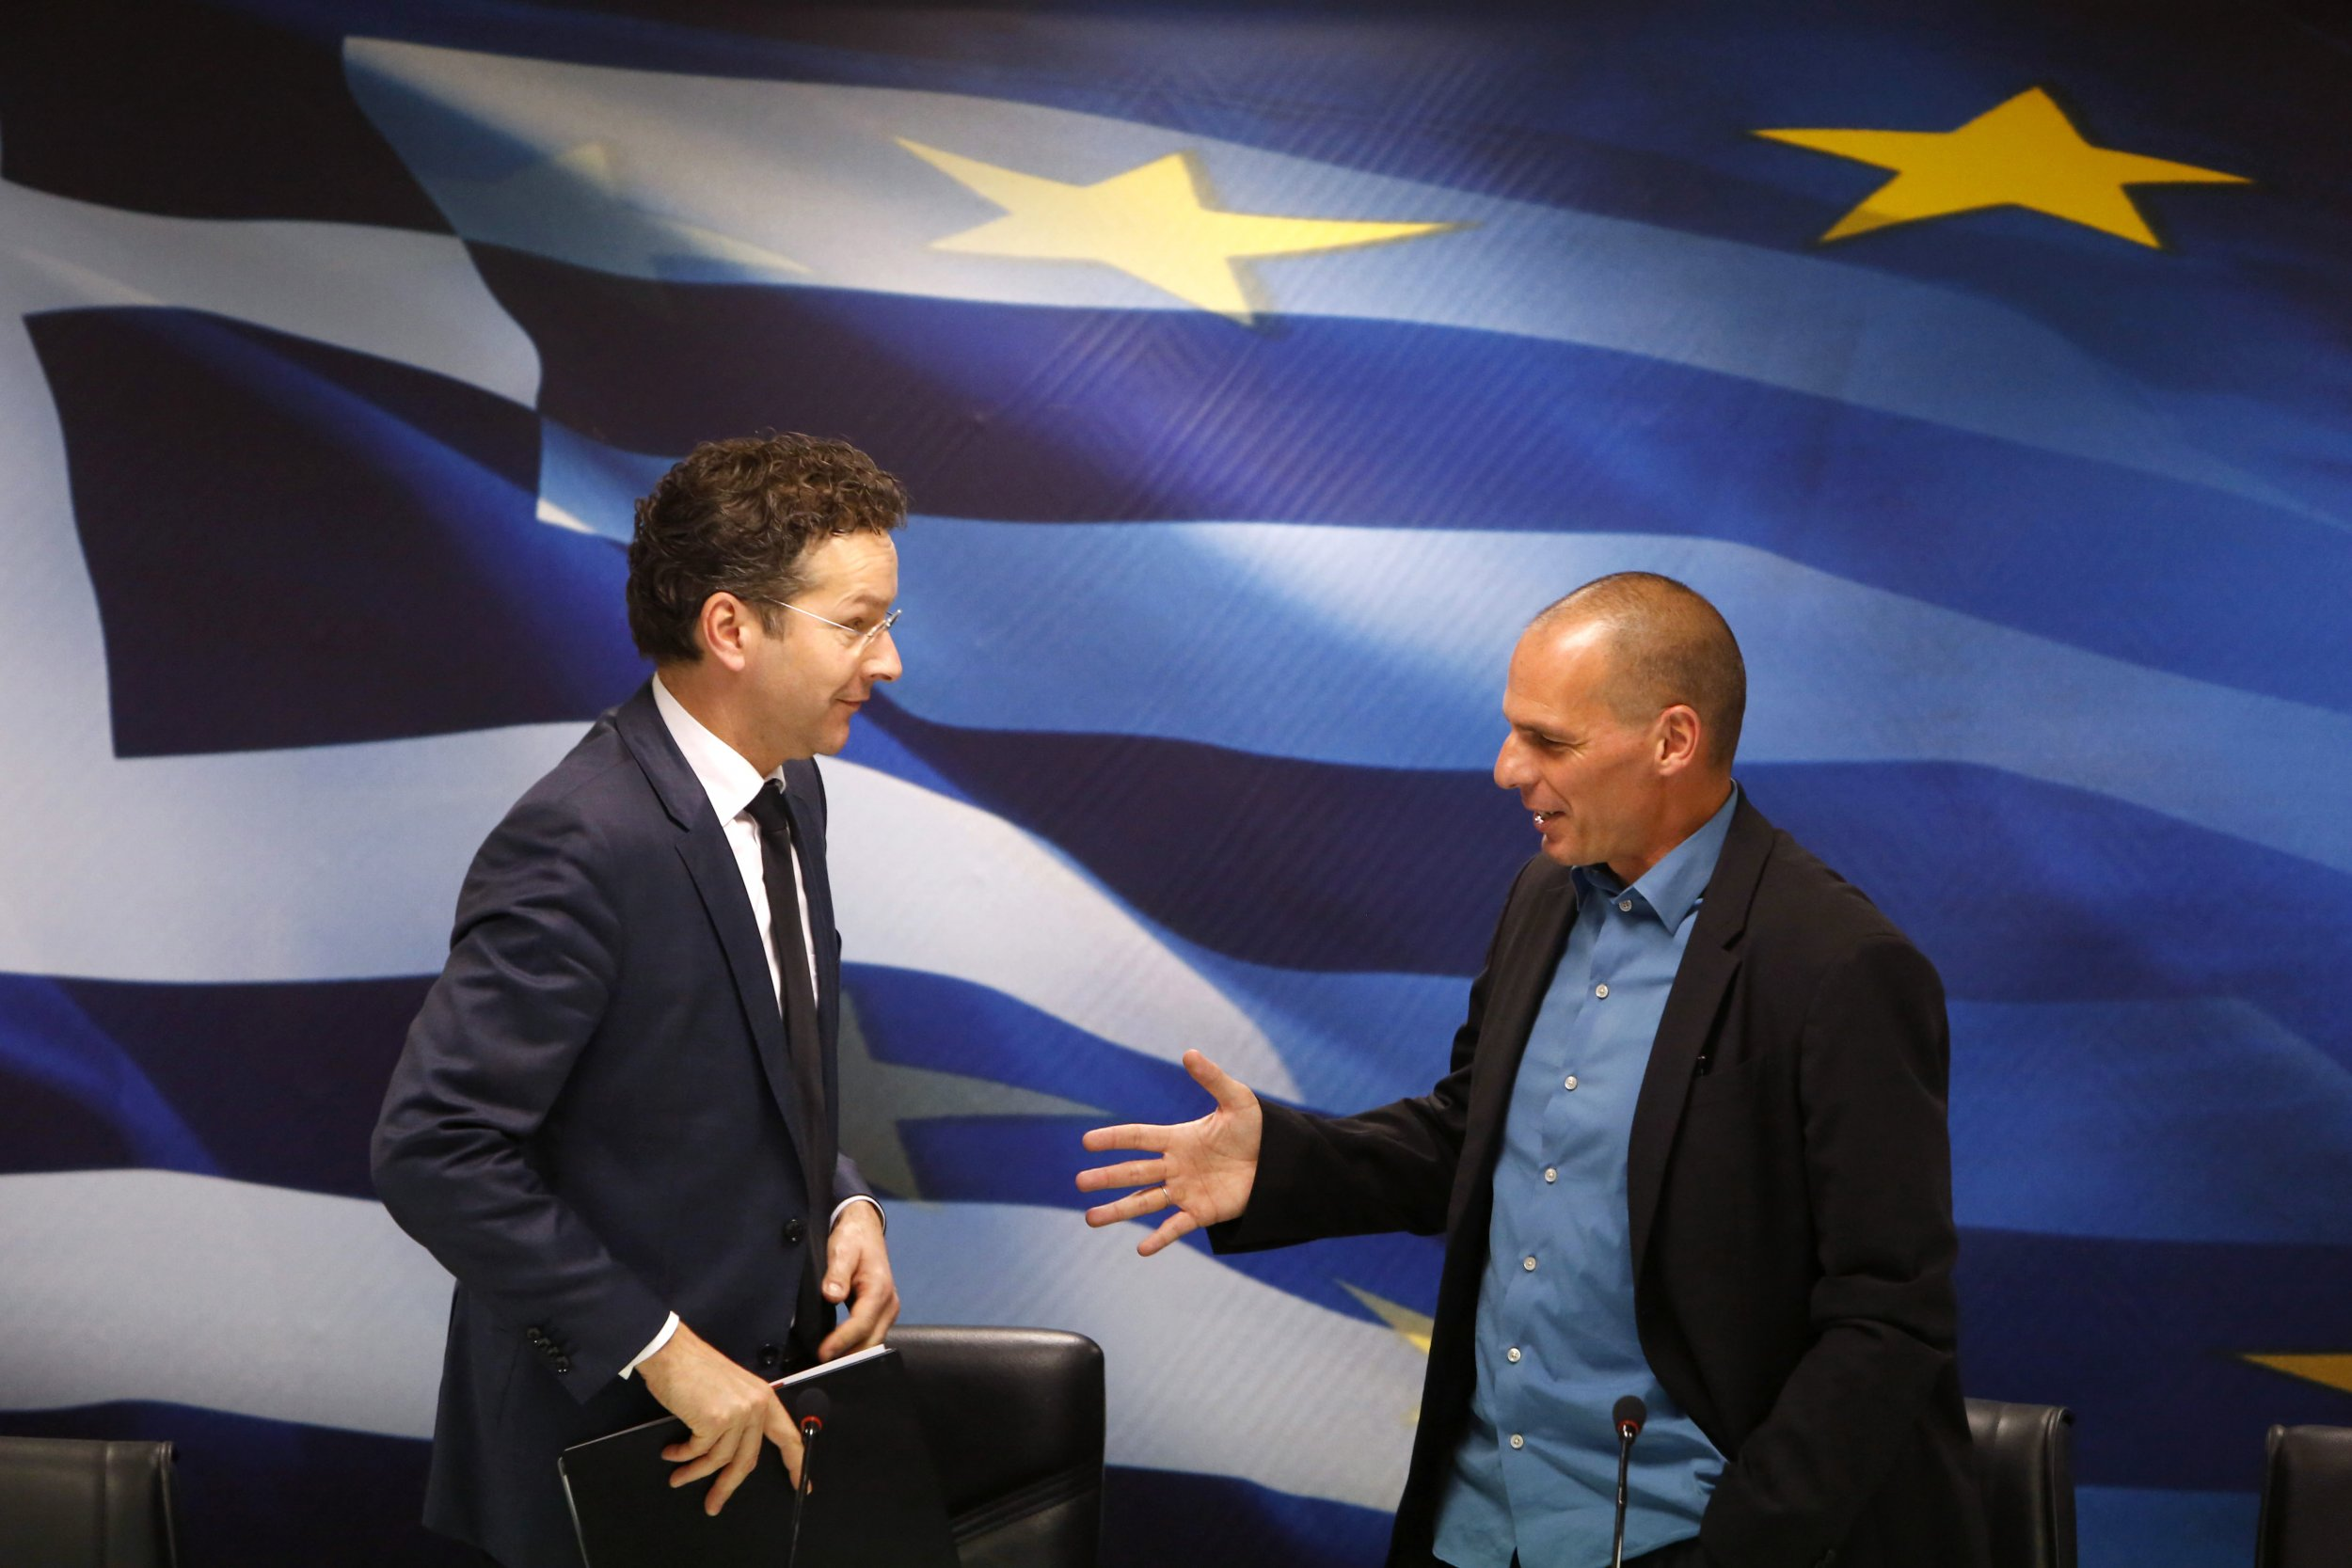 Dijsselbloem and Varoufakis